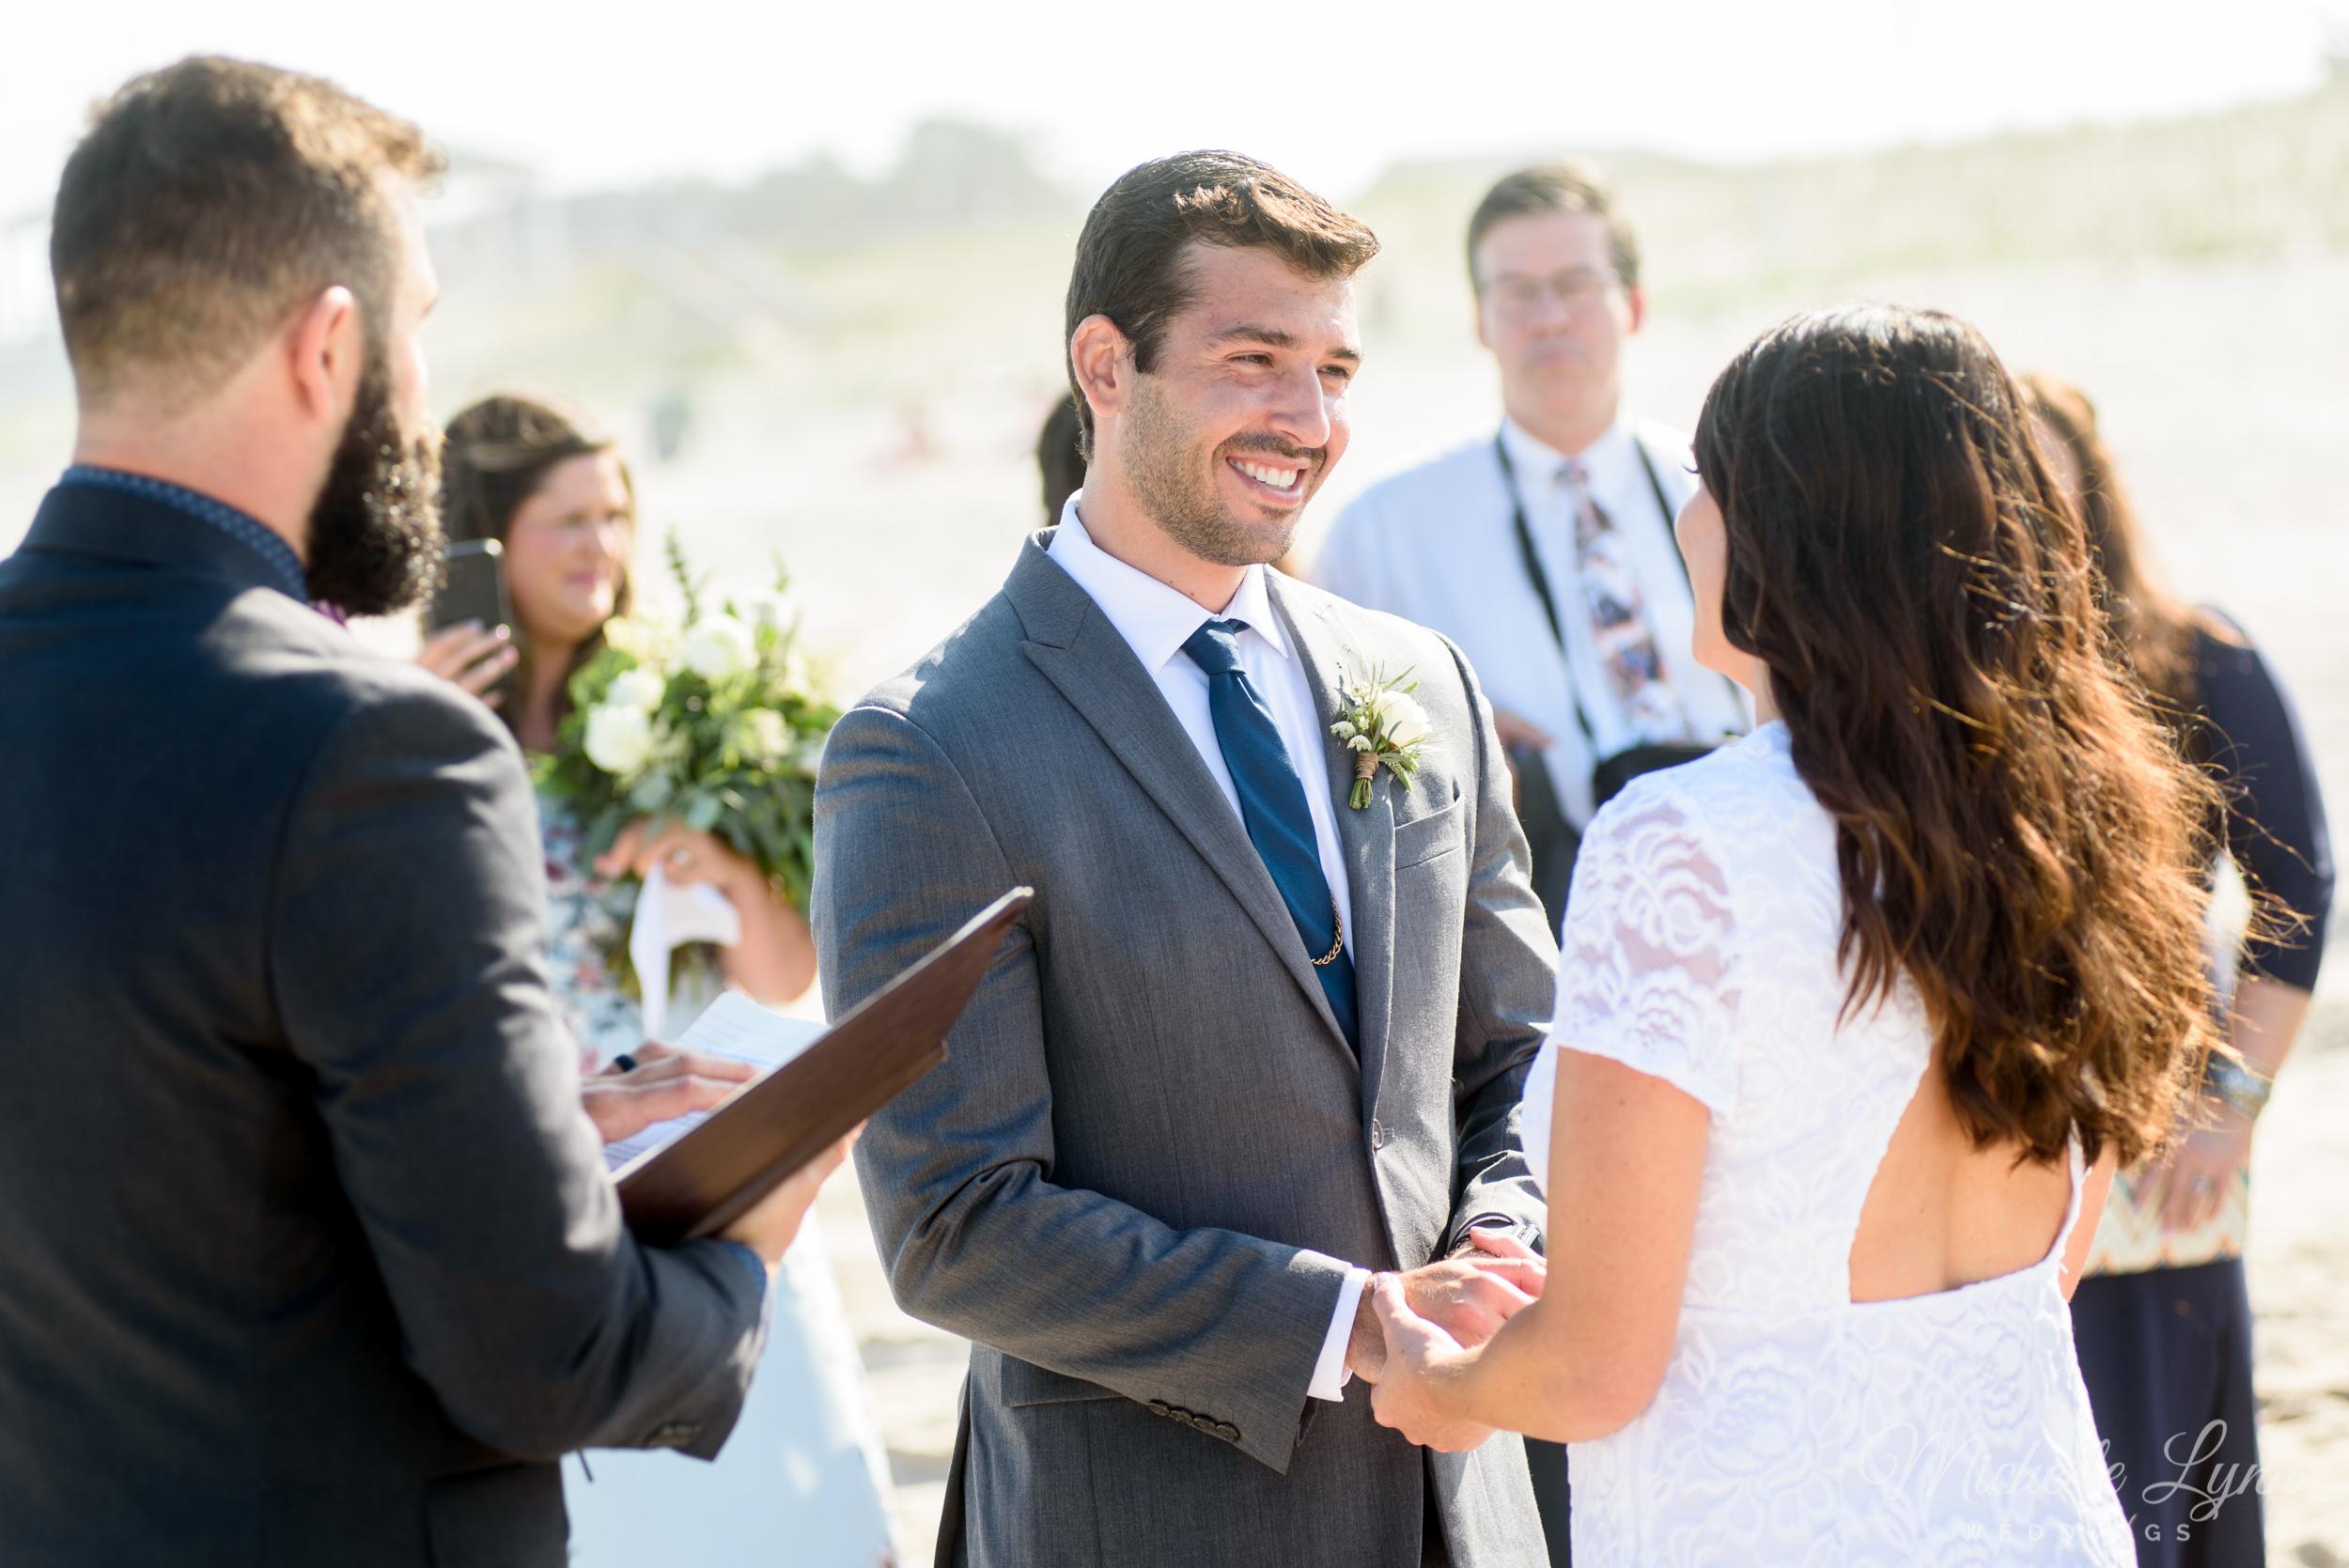 mlw-brant-beach-lbi-wedding-photography-18.jpg